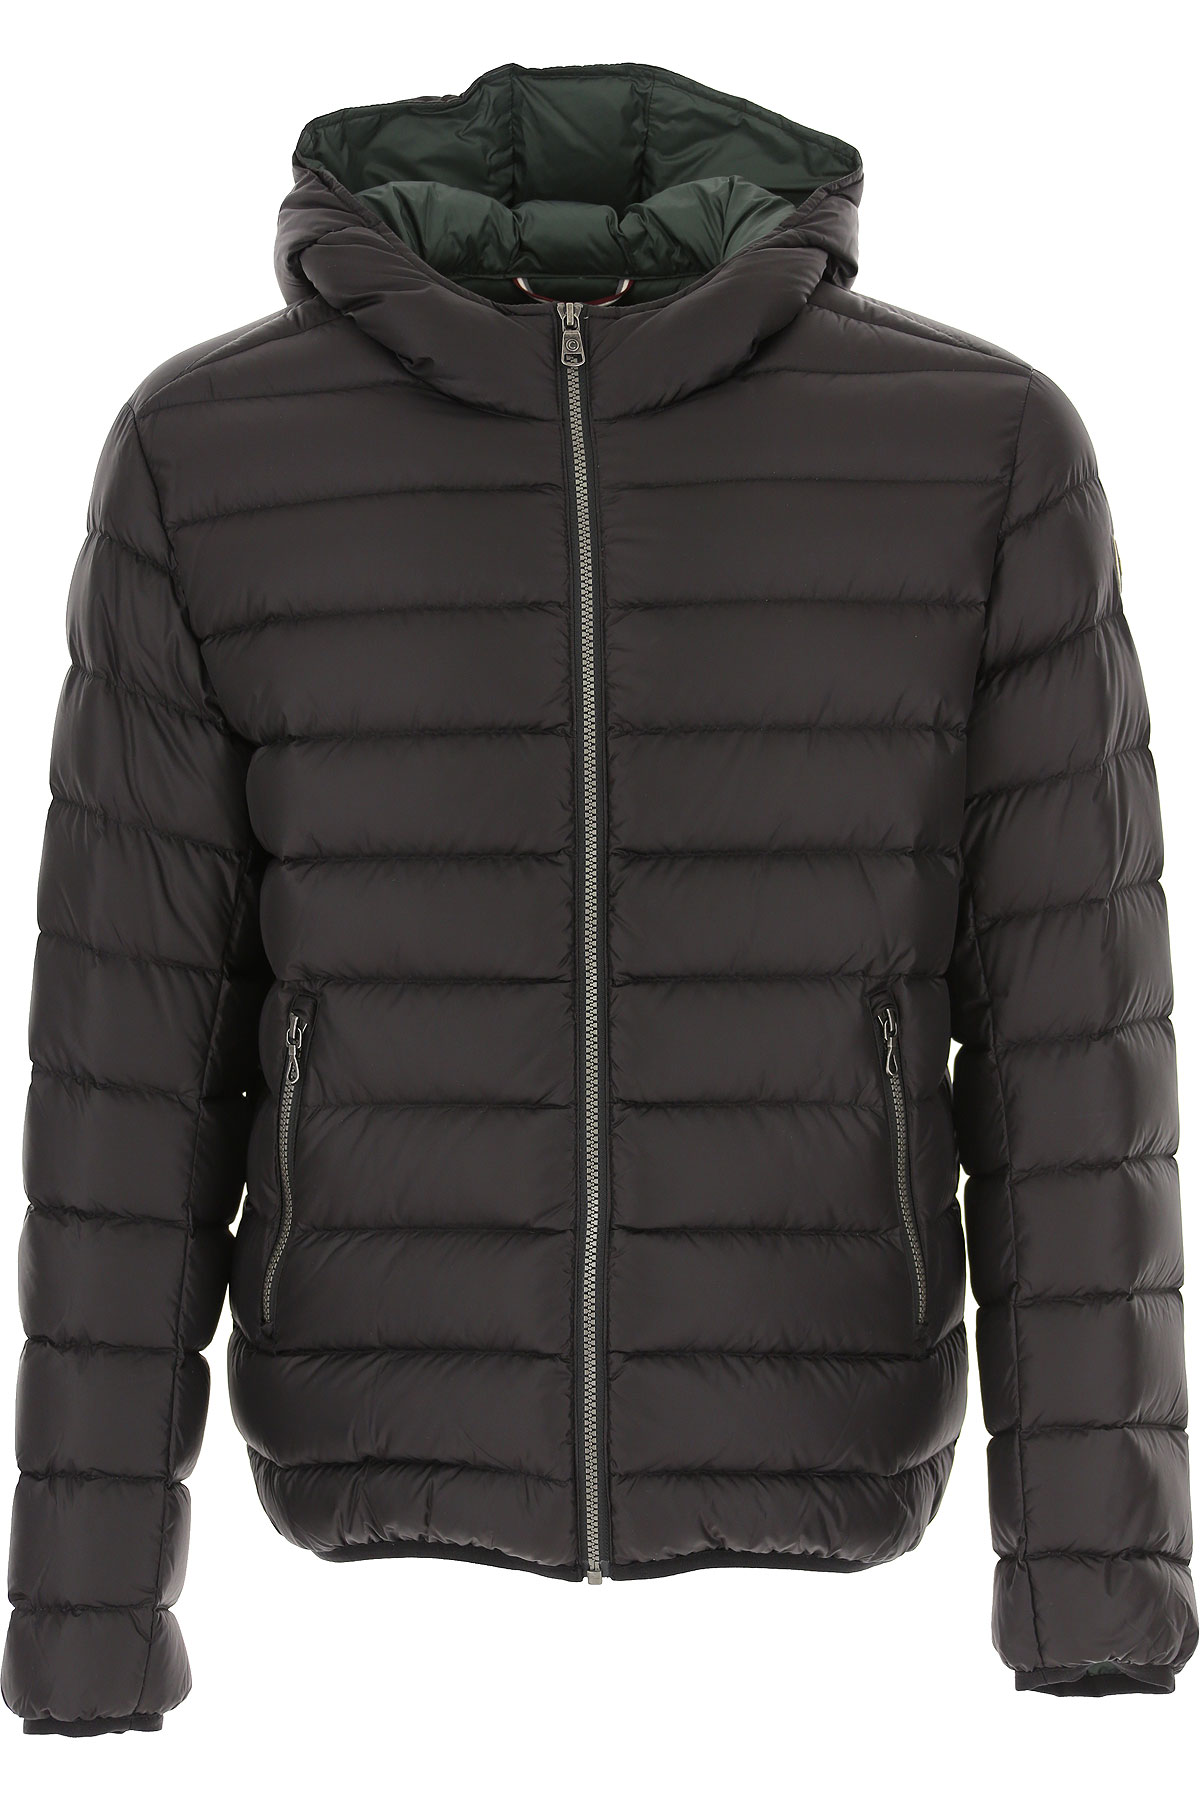 Colmar Down Jacket for Men, Puffer Ski Jacket On Sale, Black, polyamide, 2019, XL XXL